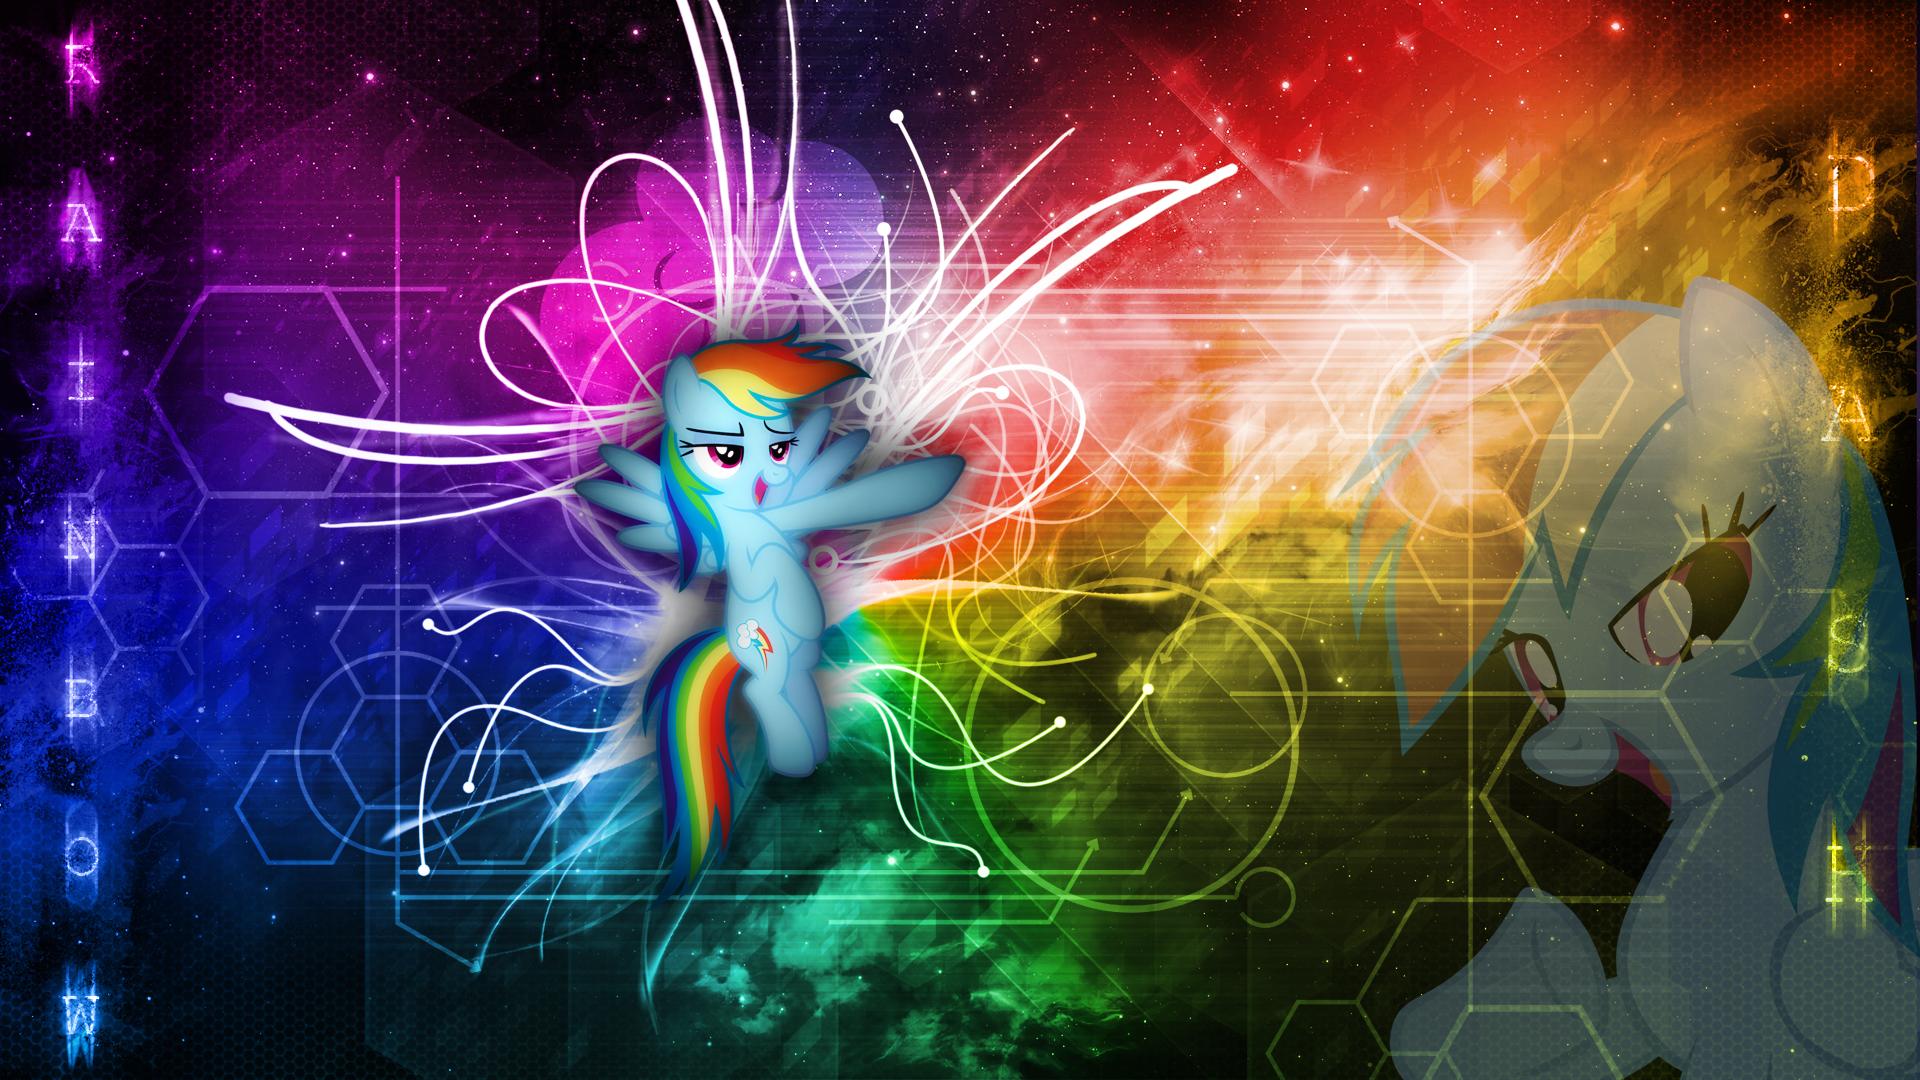 Rainbow Dash - Inspirational Wallpaper 1920x1080 by ...